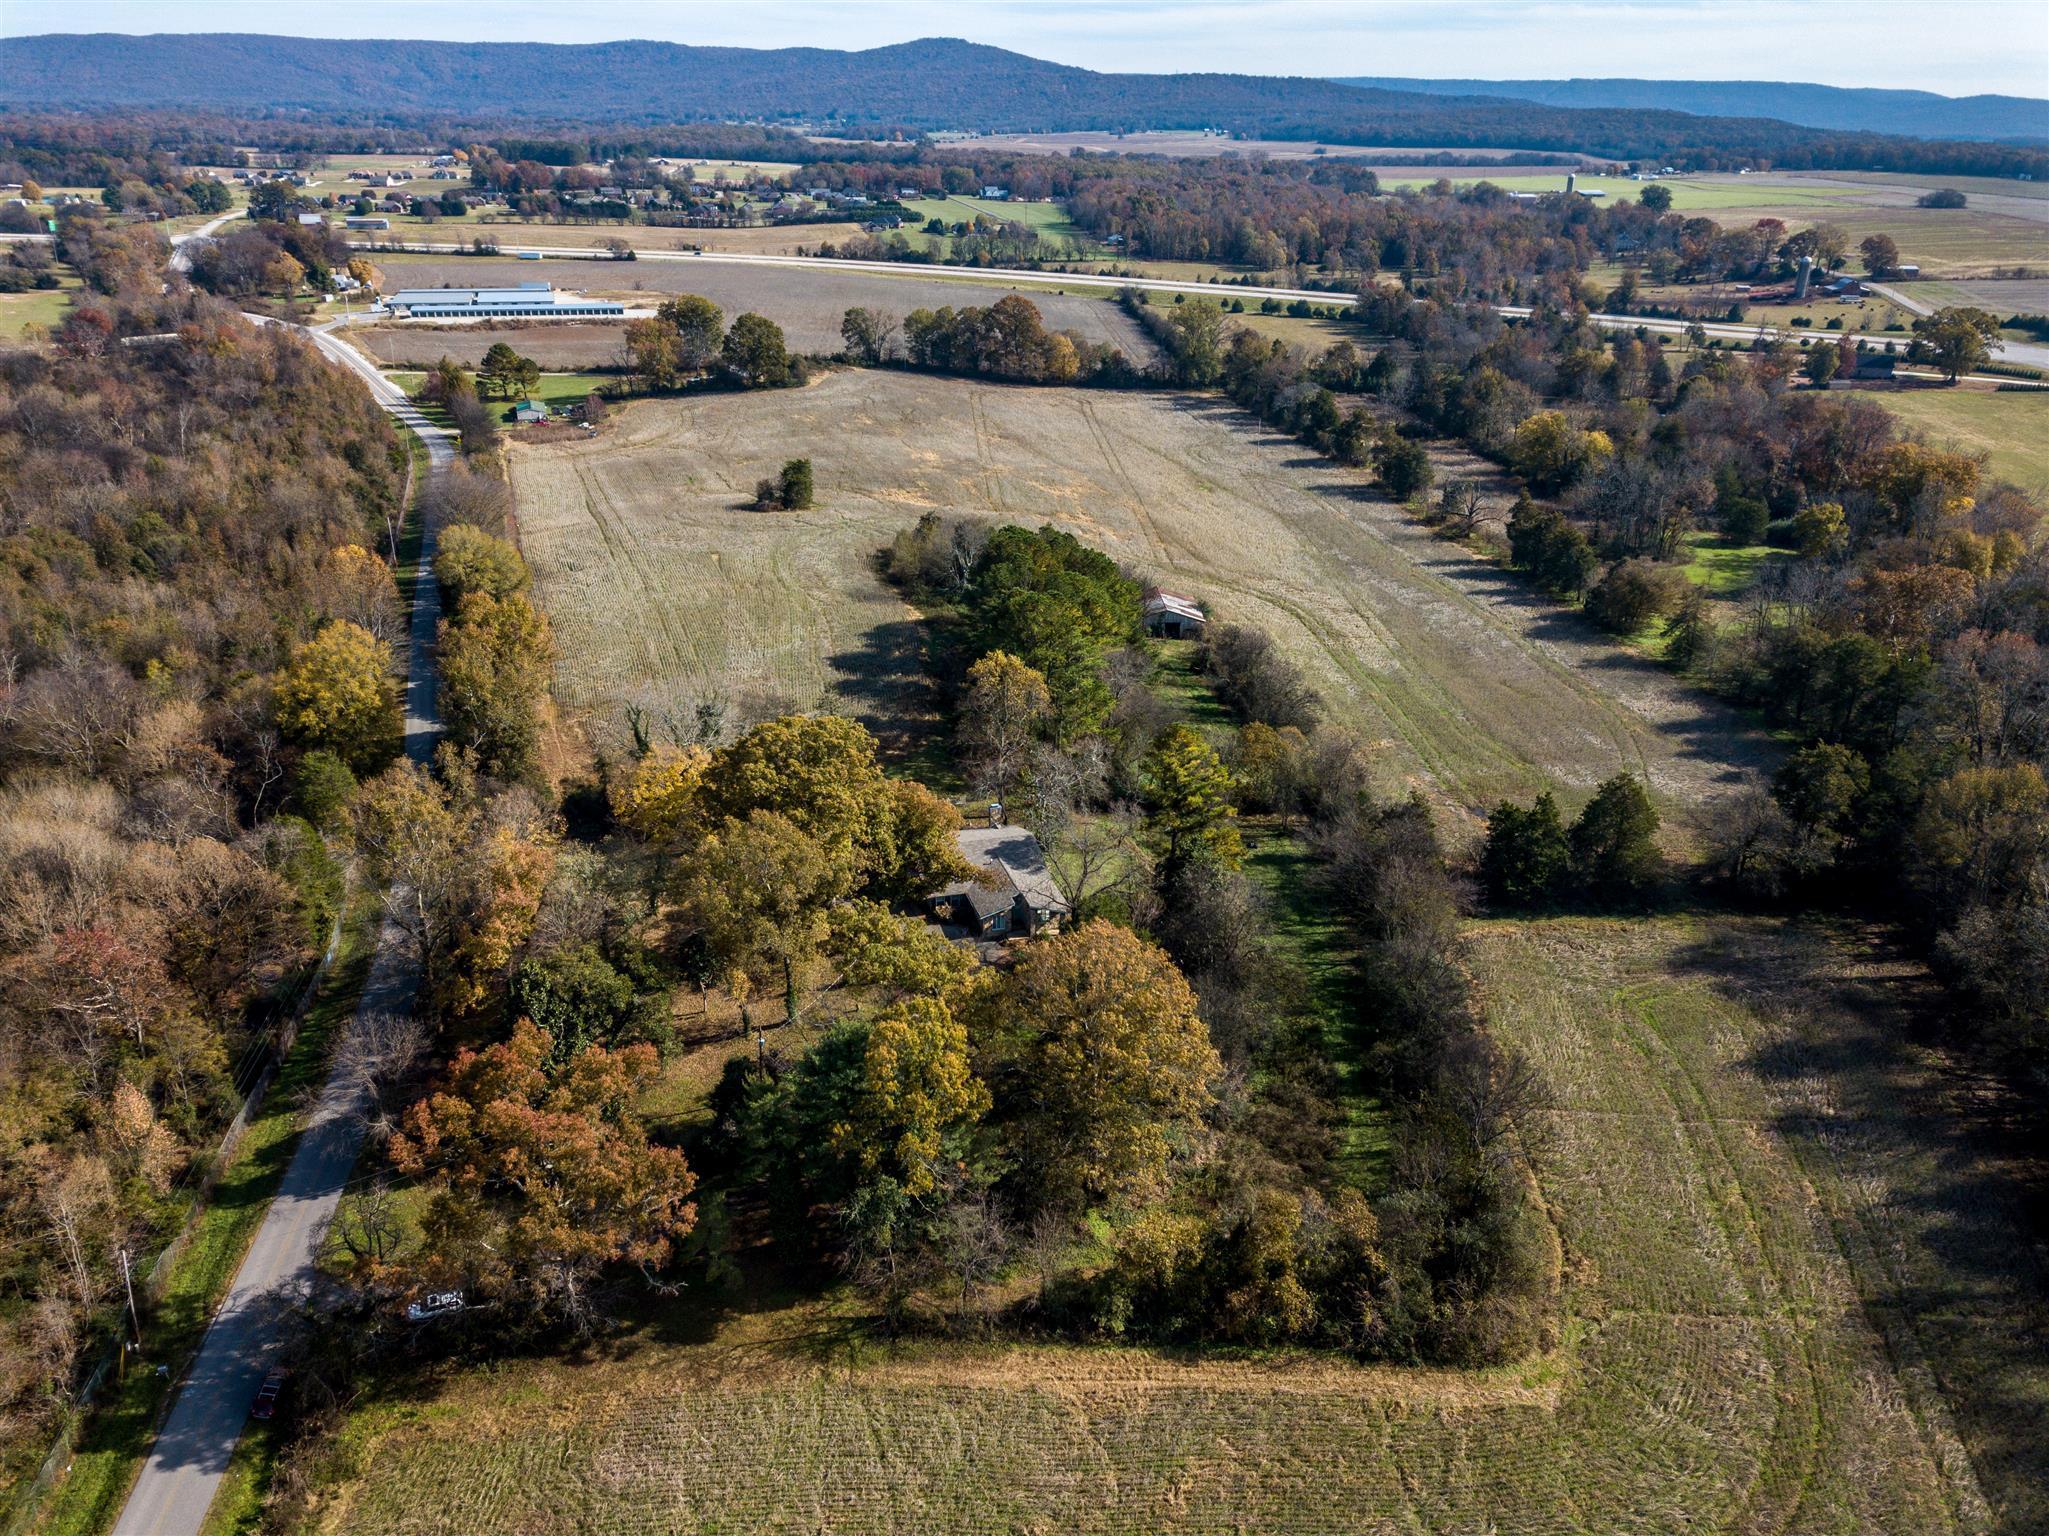 0 Blue Spring Rd Lot, Decherd, TN 37324 - Decherd, TN real estate listing